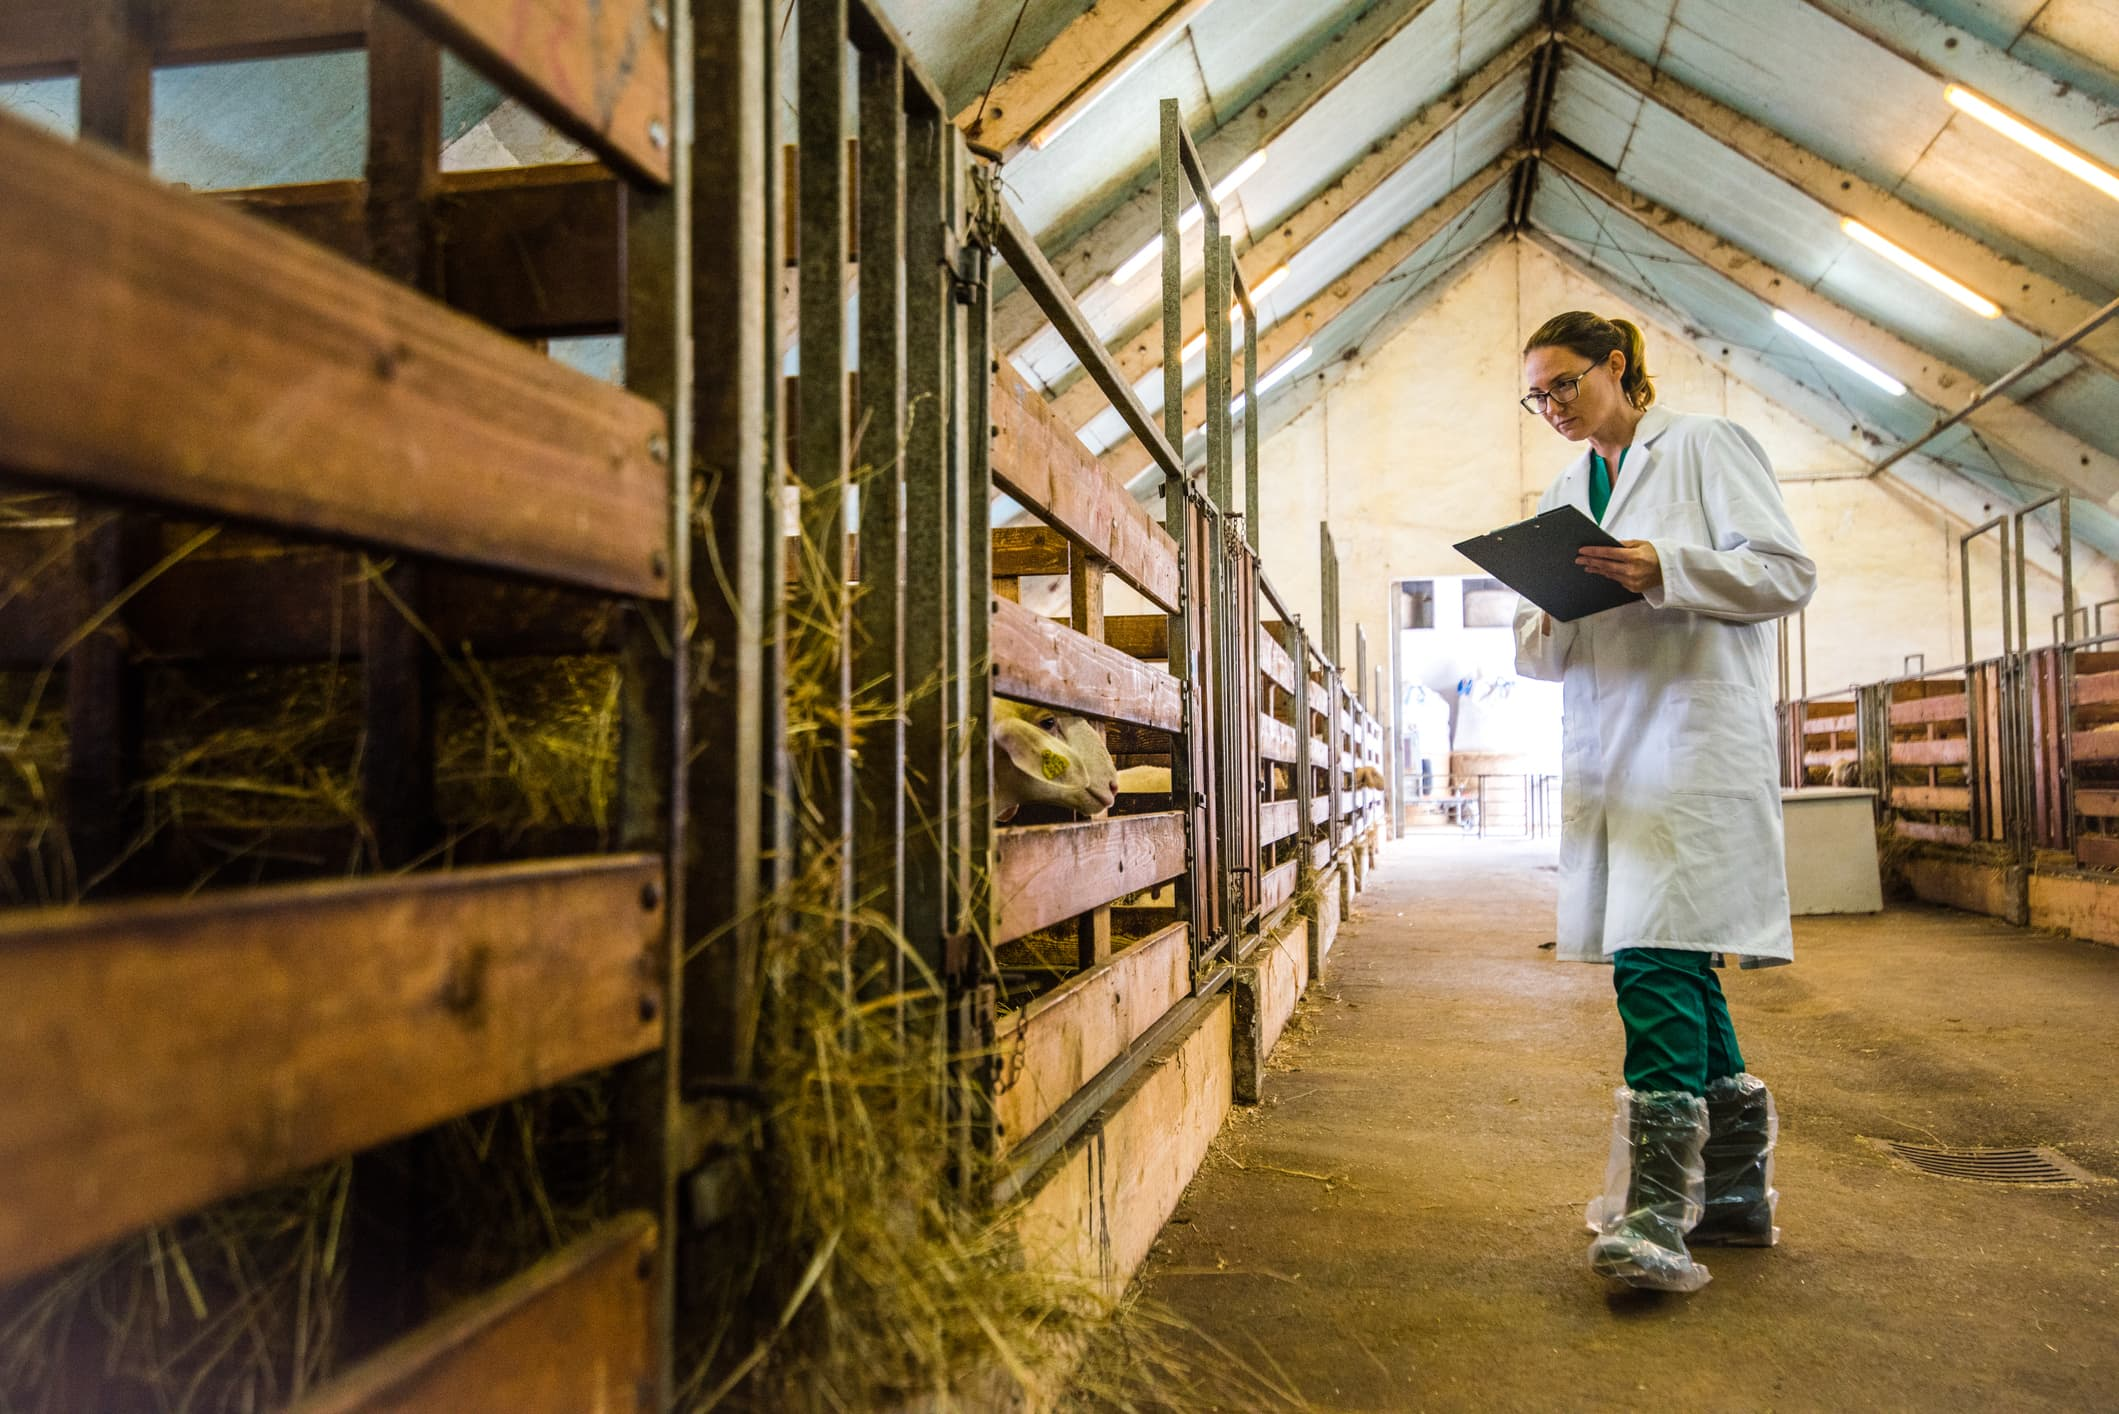 GP: Veterinarian examining sheep in barn